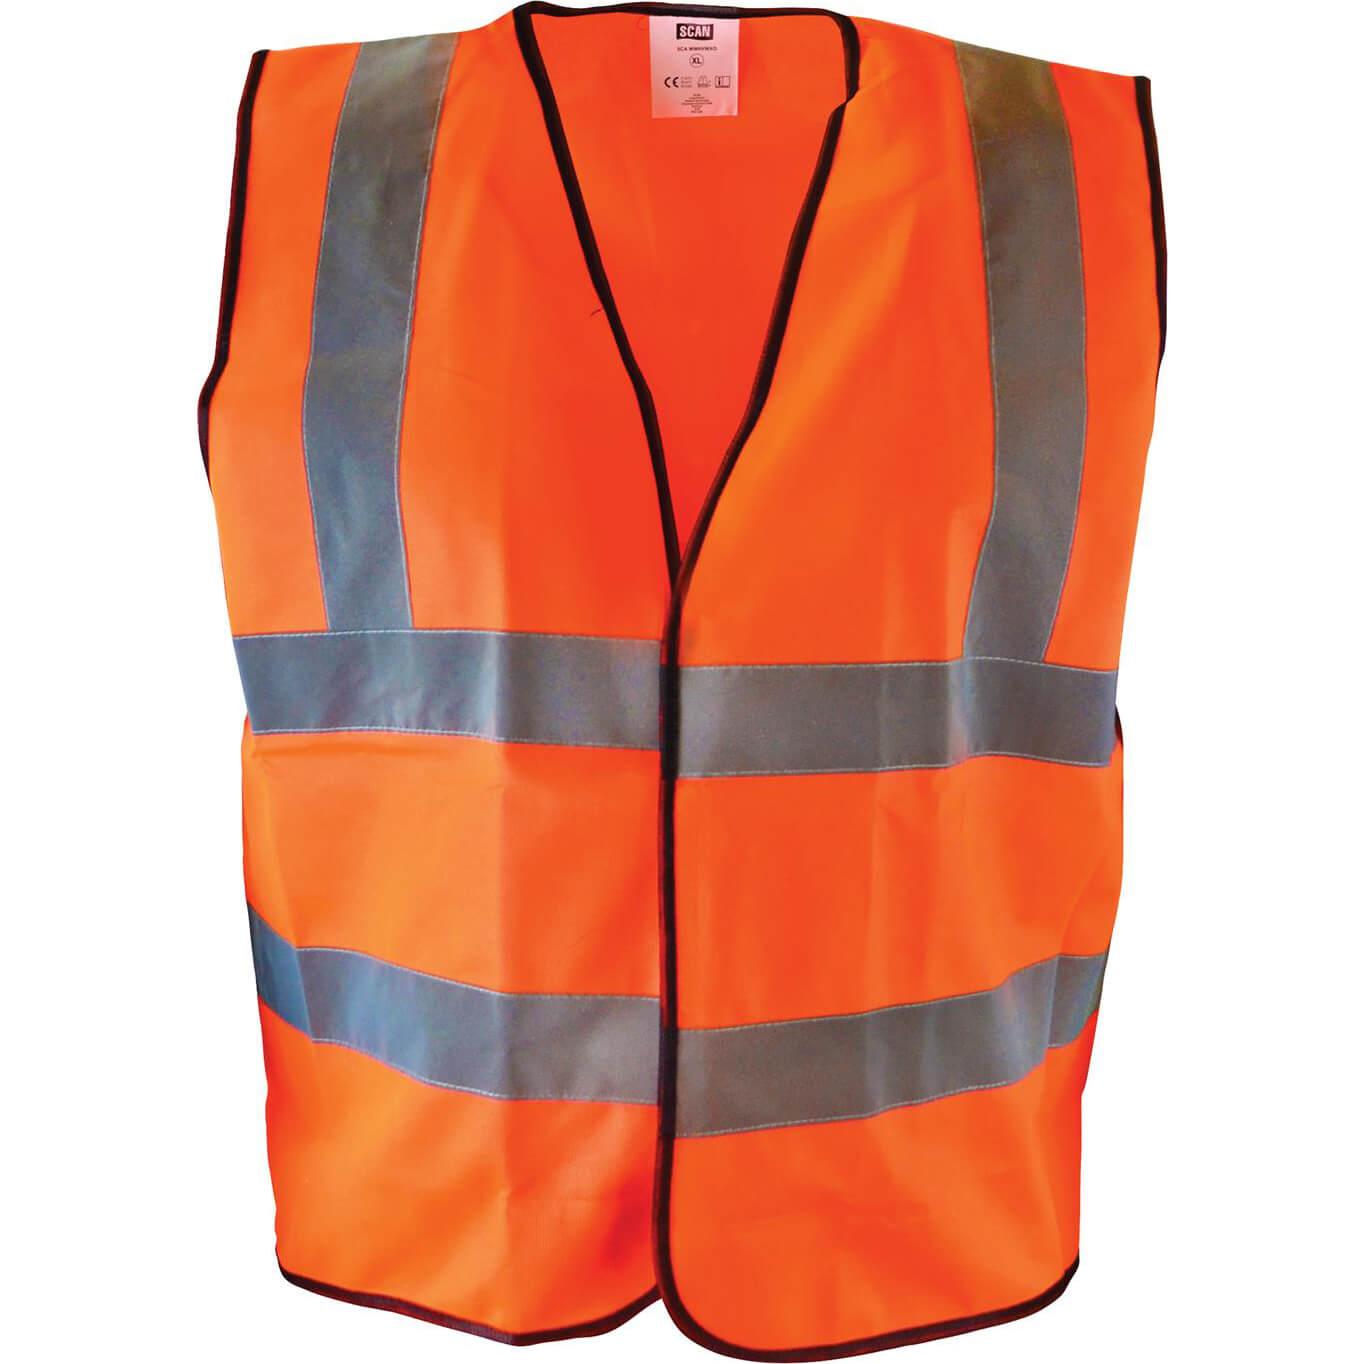 Image of Scan Hi Vis Waistcoat Orange L